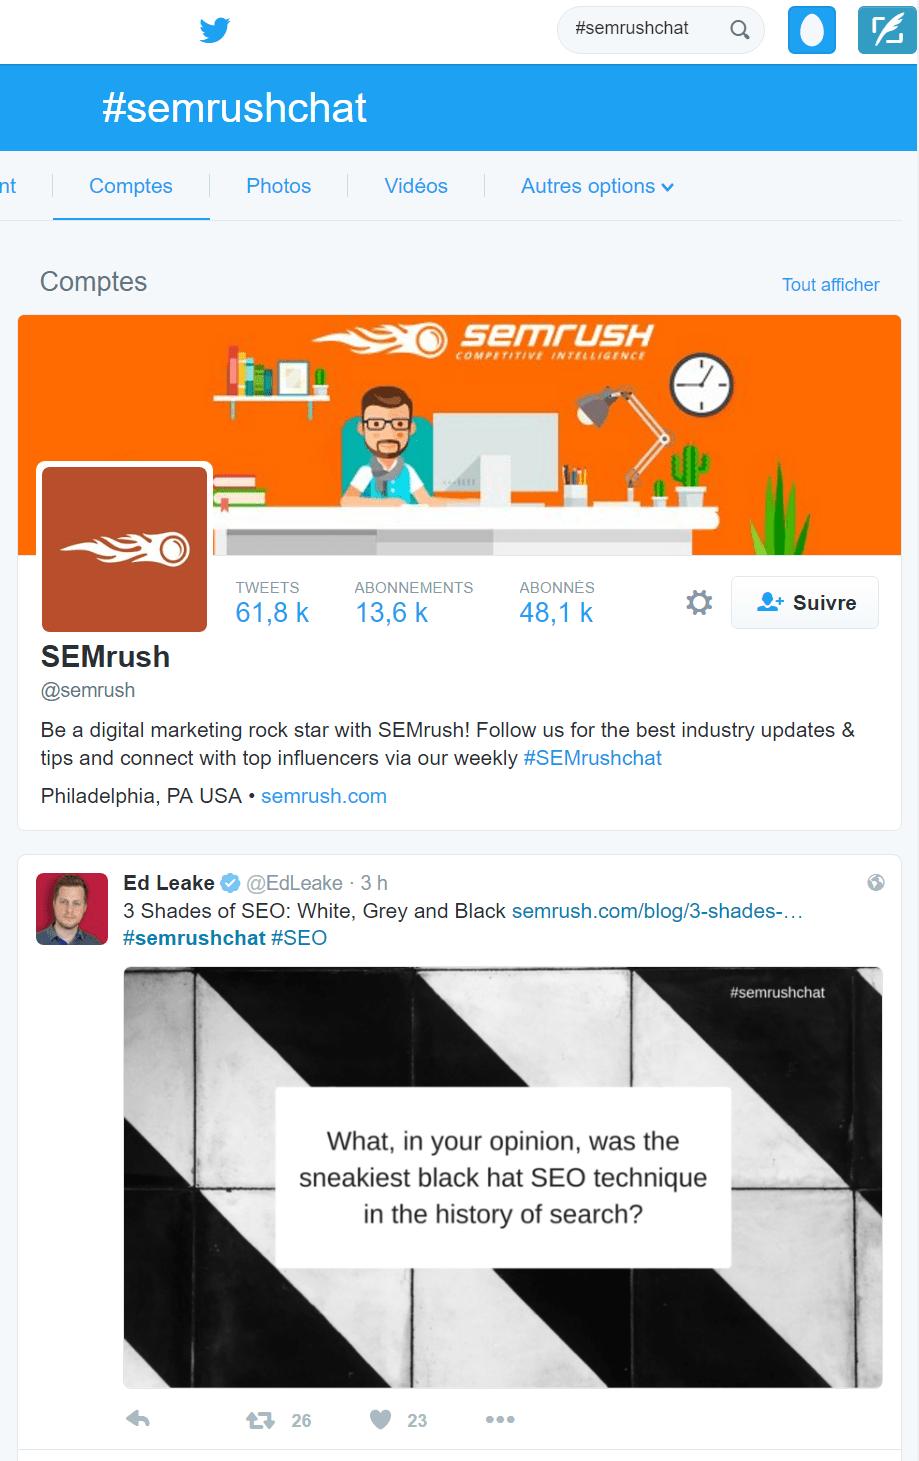 semrush-hashtag-twitter